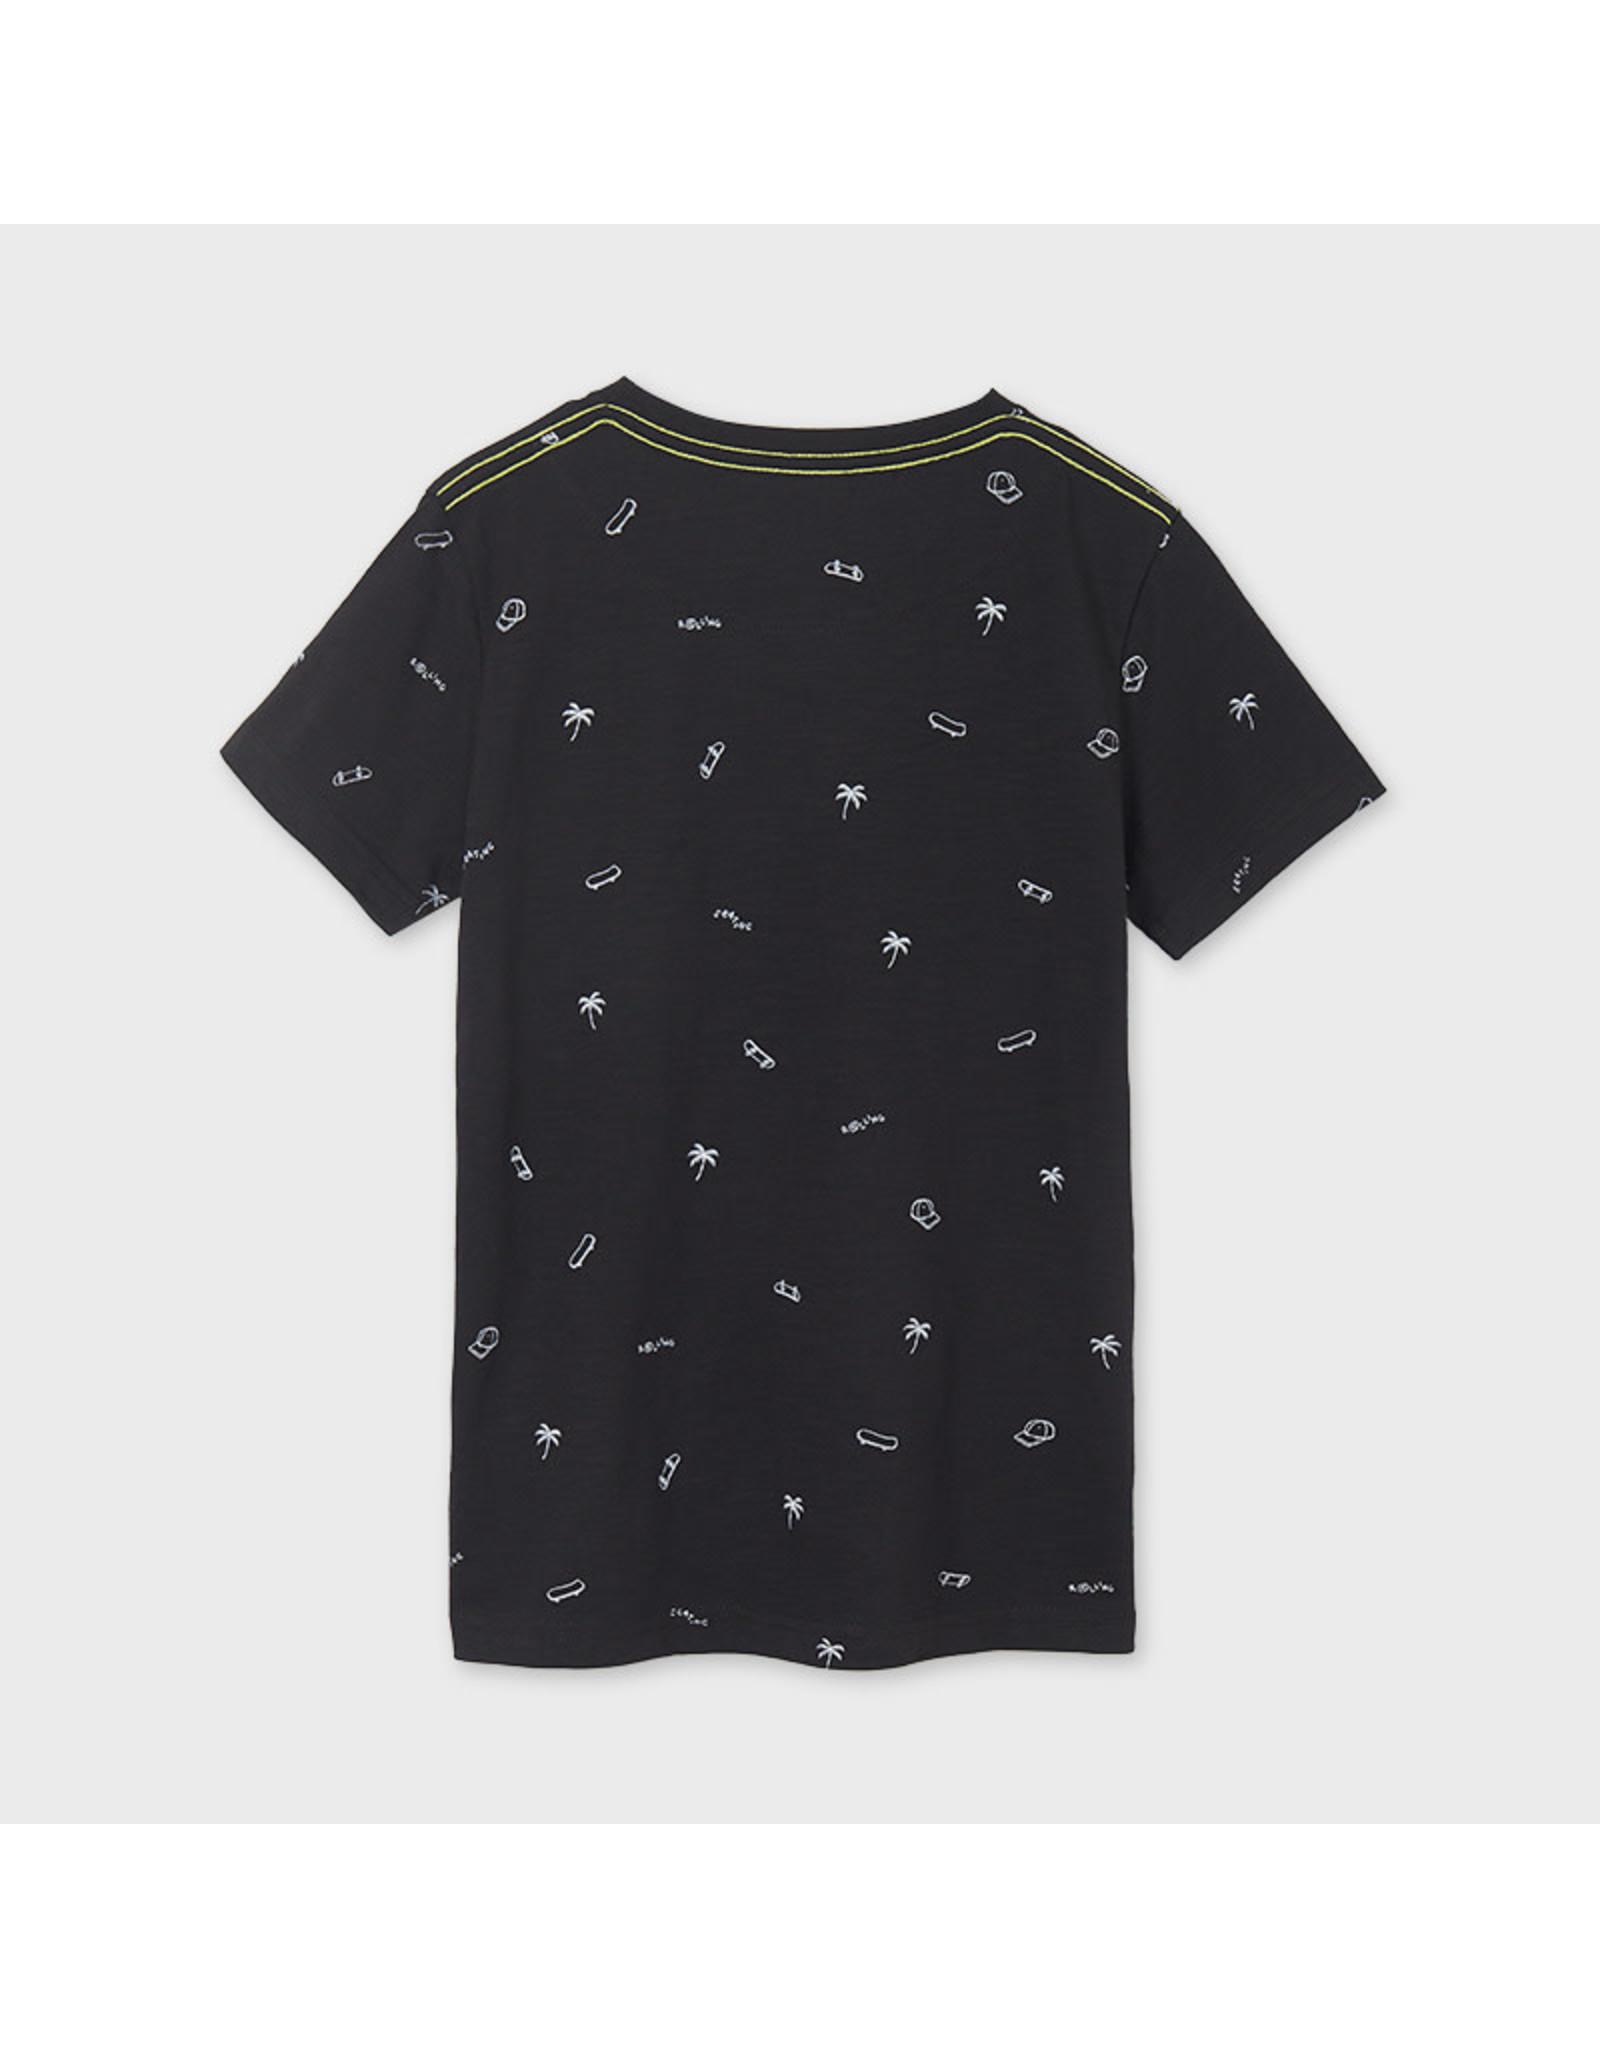 Mayoral Vynil Printed Short Sleeve T-Shirt